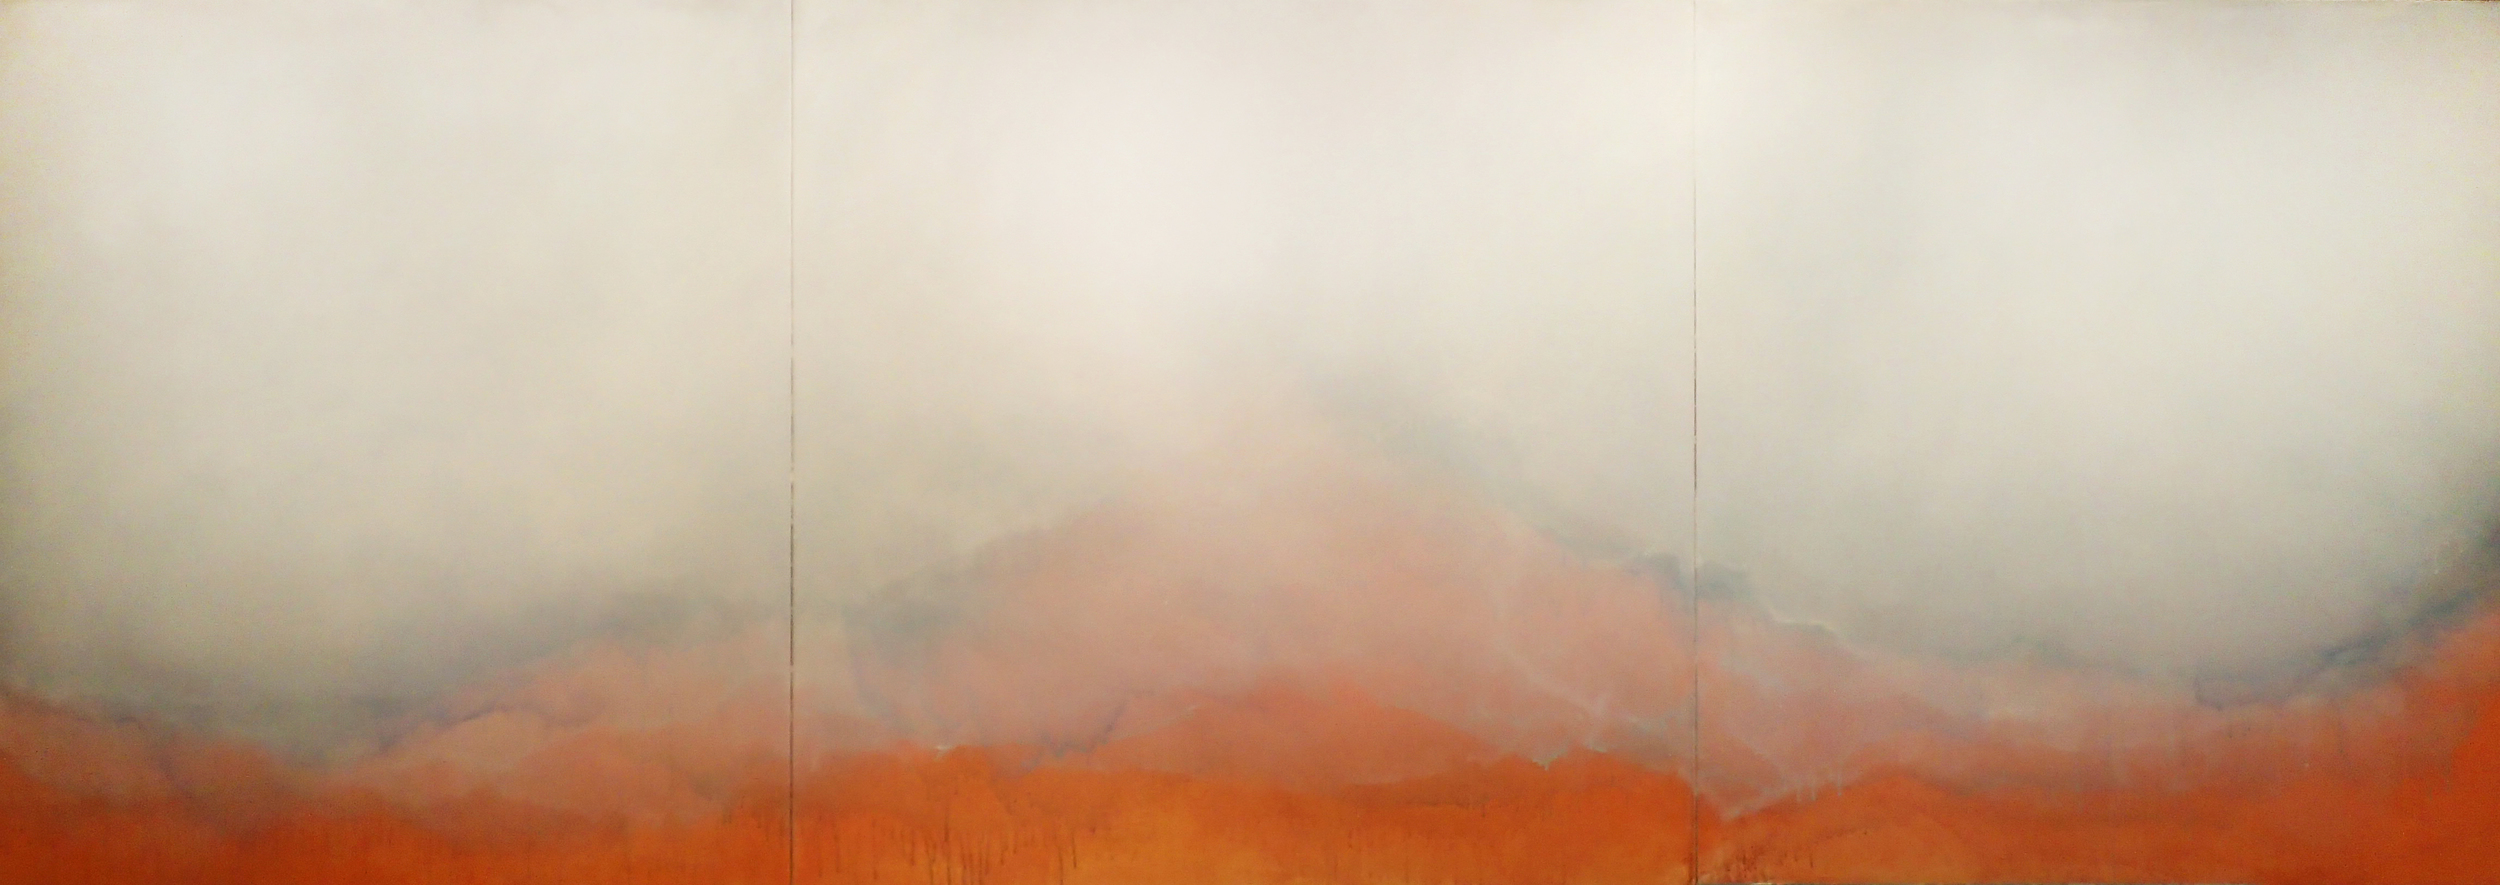 "Untitled, 2015, acrylic on canvas, 48"" x 144"""